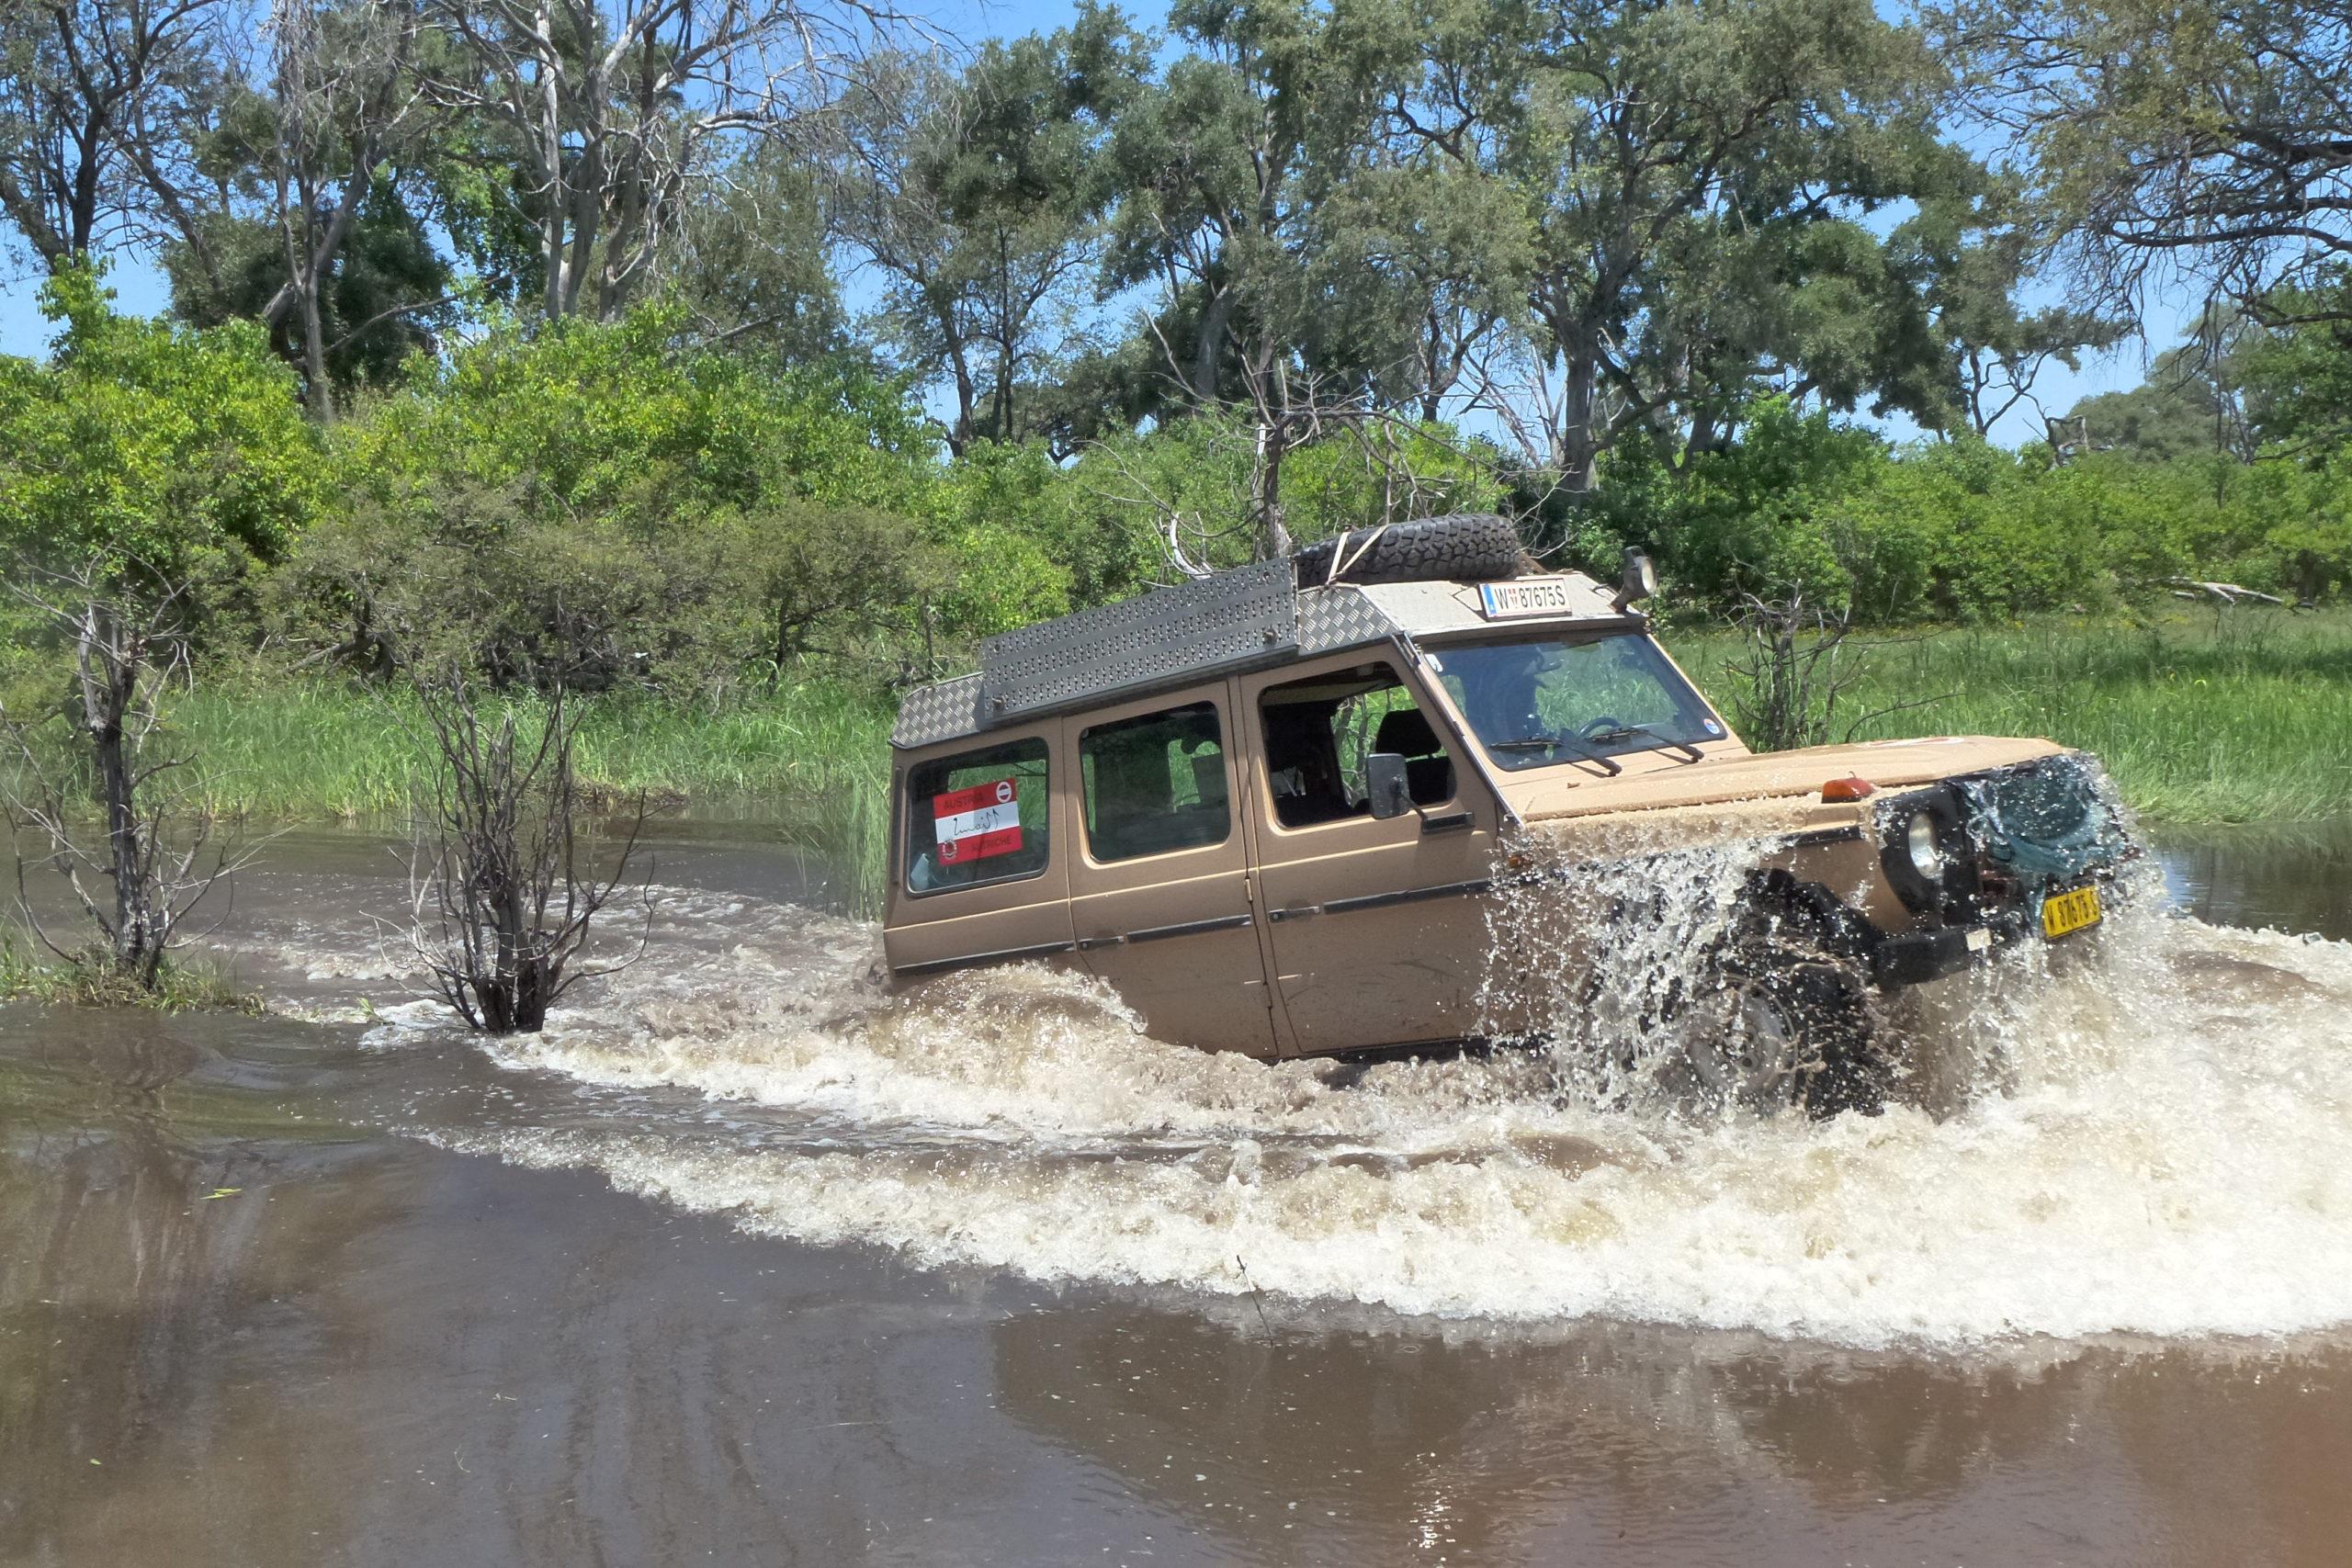 4x4 Abenteuerreise: Baden in Afrika 2